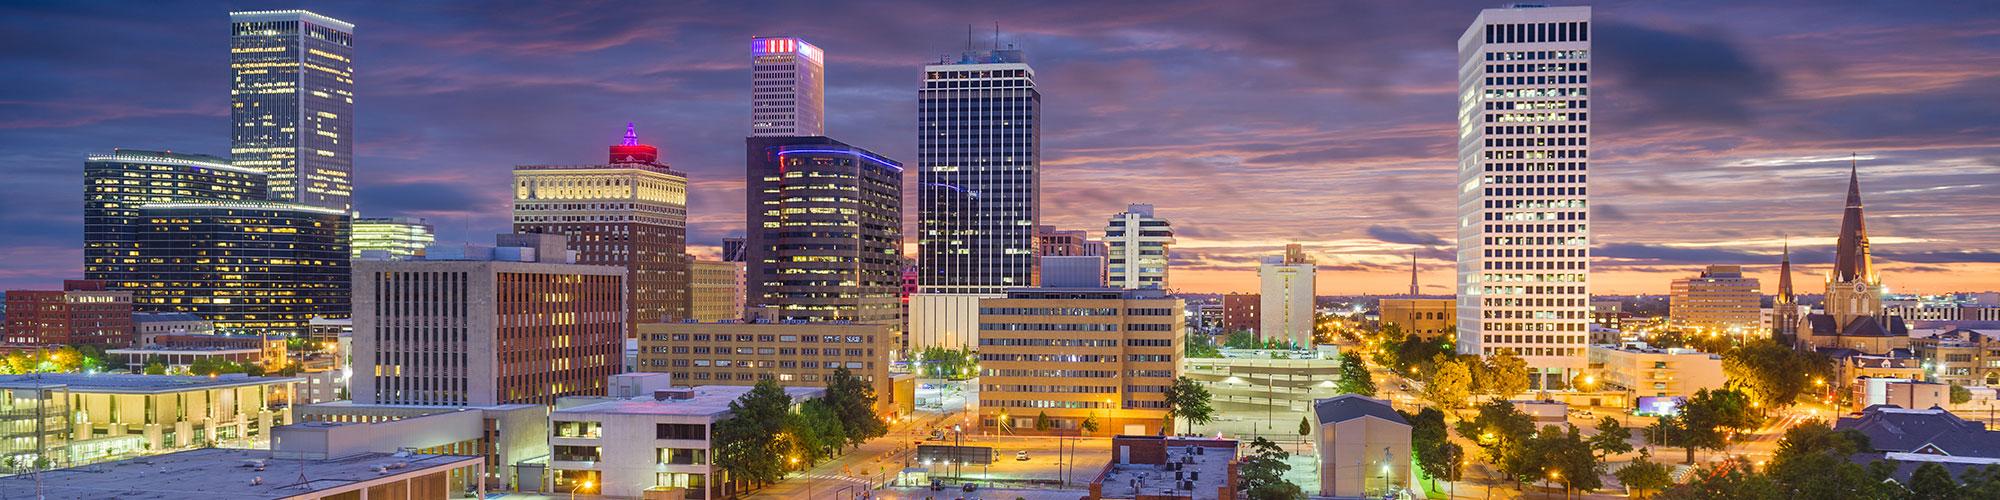 Tulsa OK